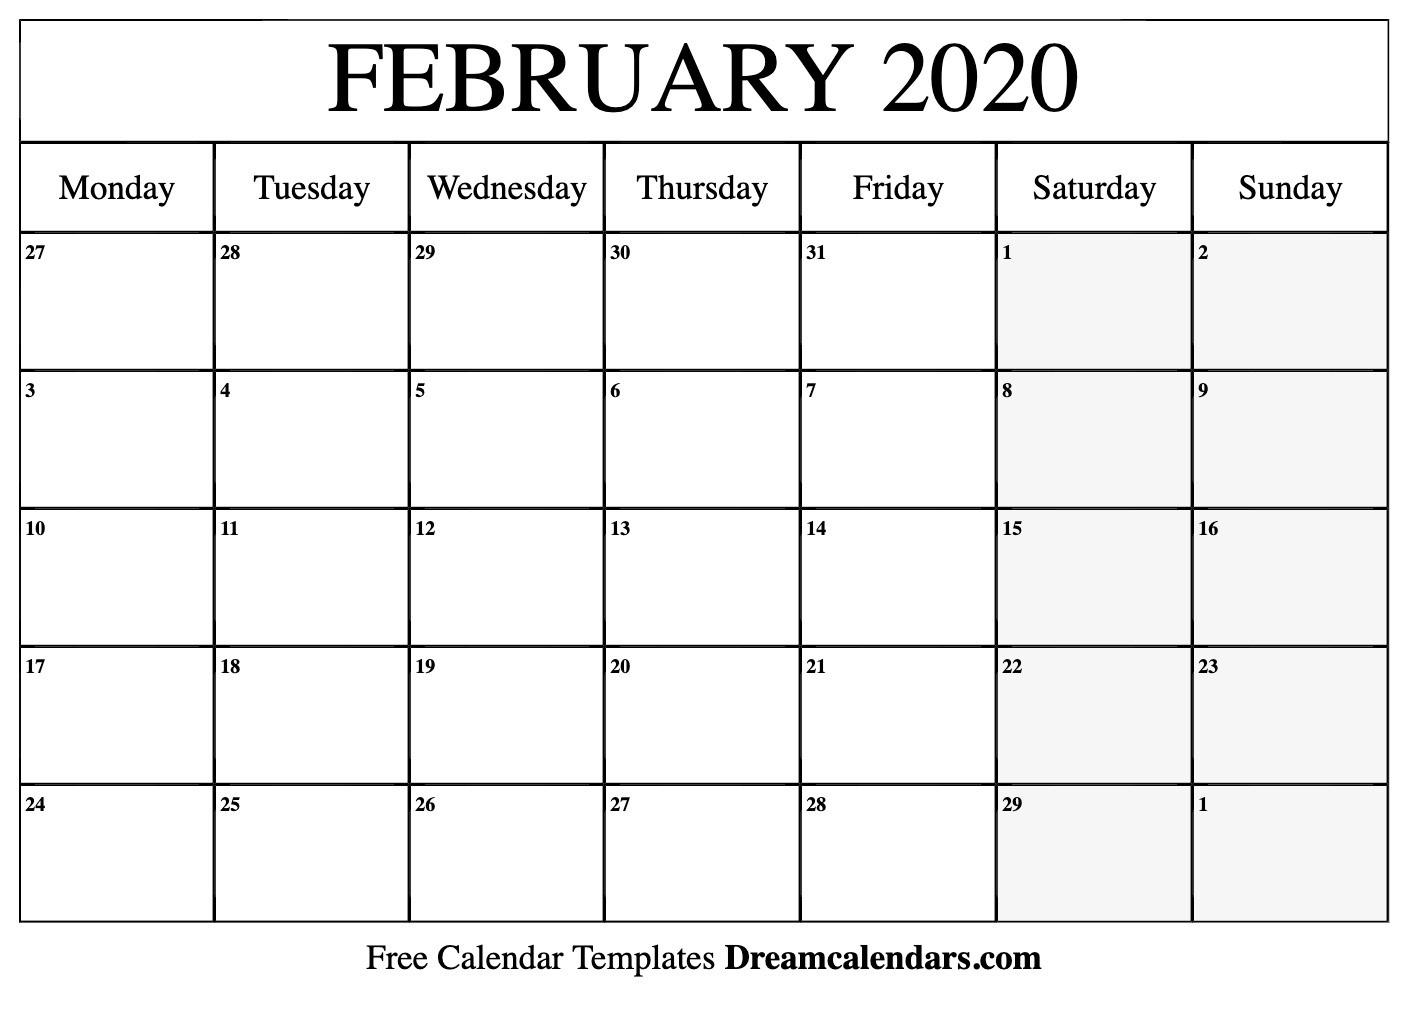 Printable February 2020 Calendar  Feb 2020 Calendar